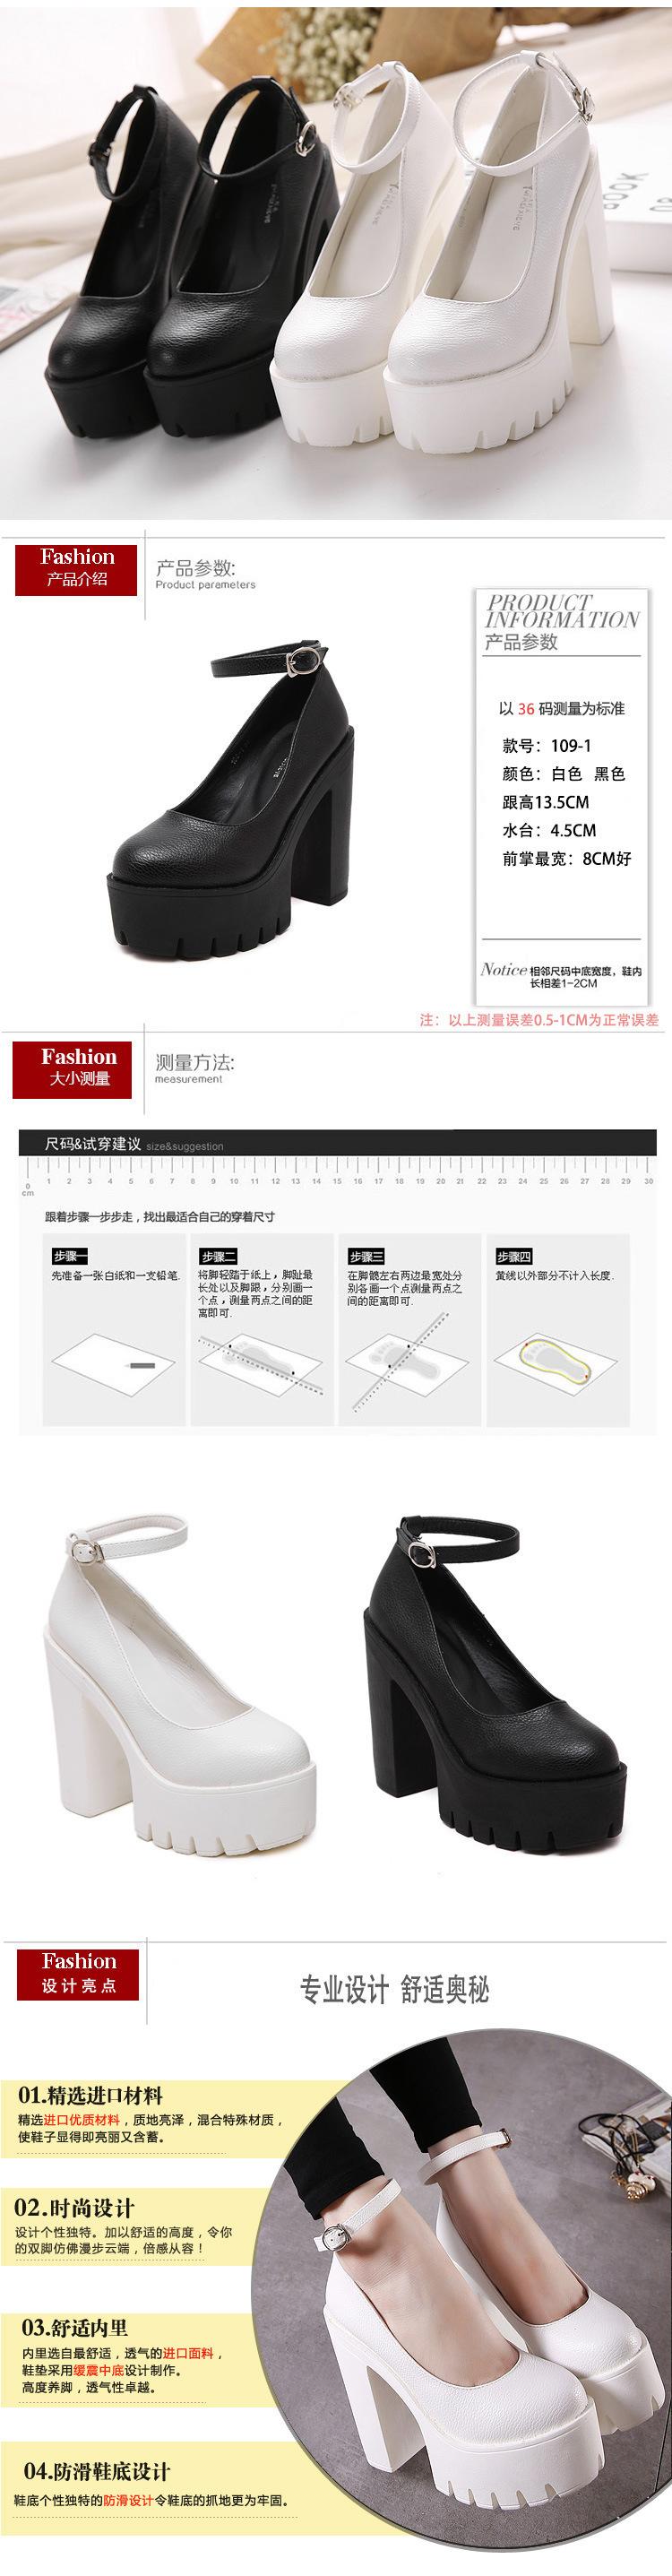 item.1495555138221989767.jpg